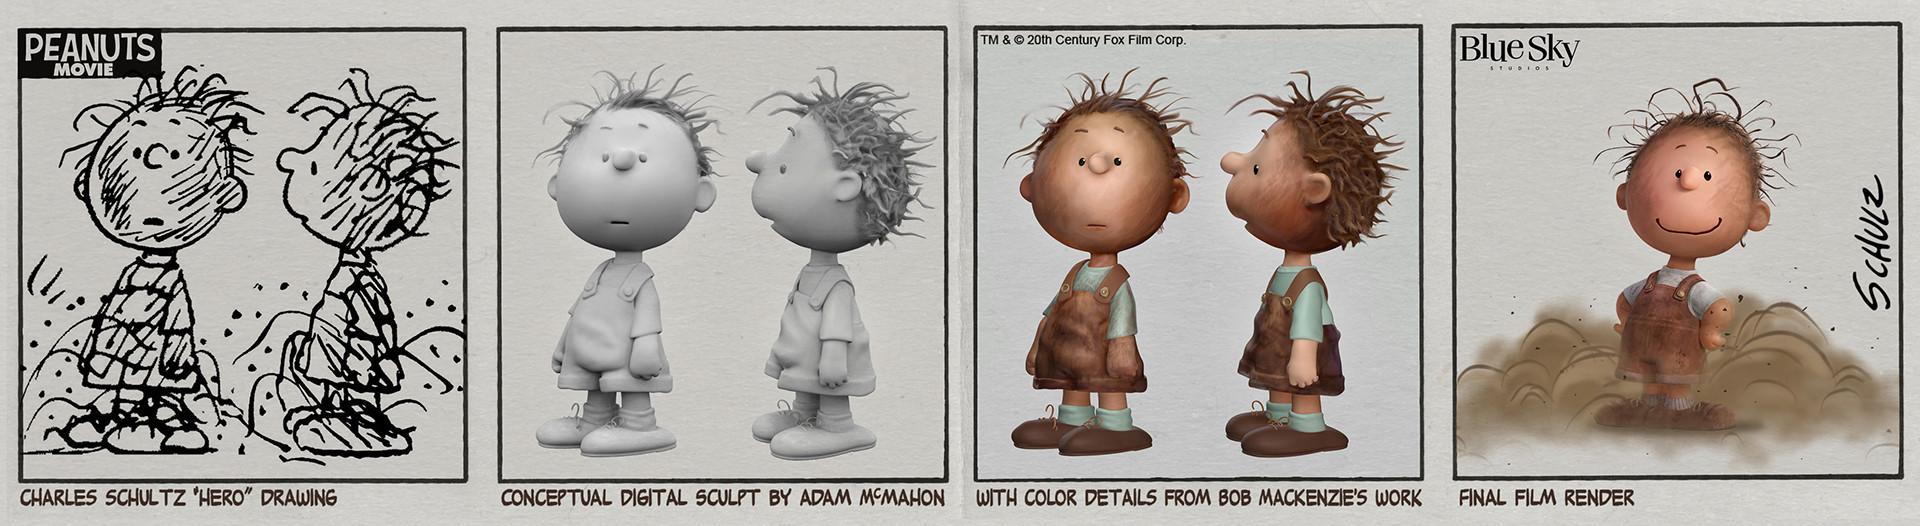 peanutsPigpenConceptSculpt.jpg